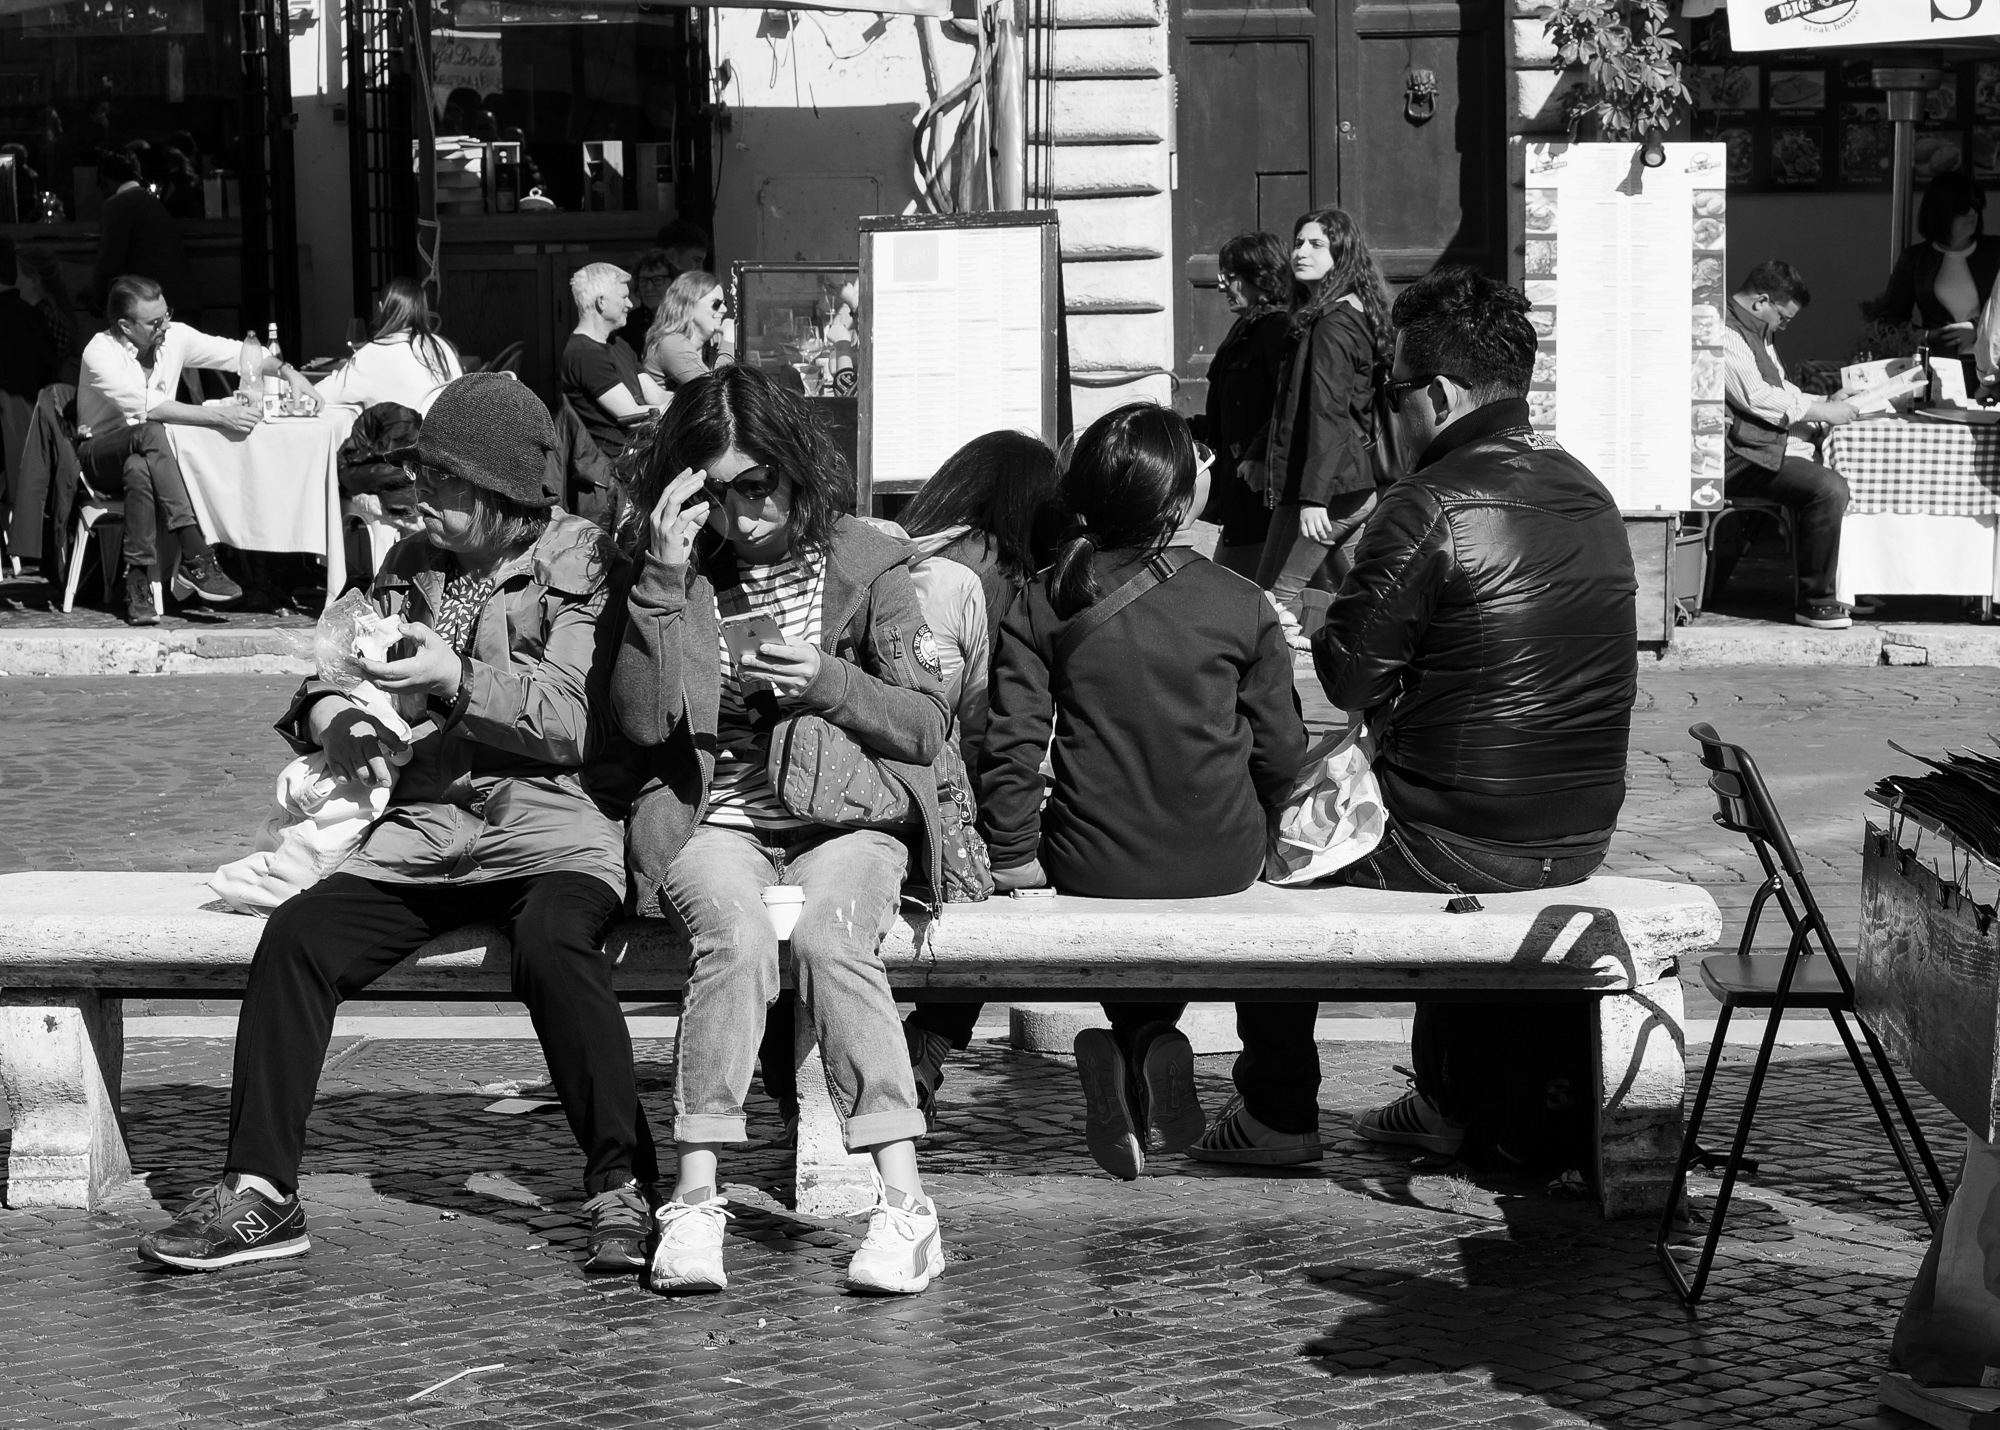 People Piazza Navona, Rome 2018